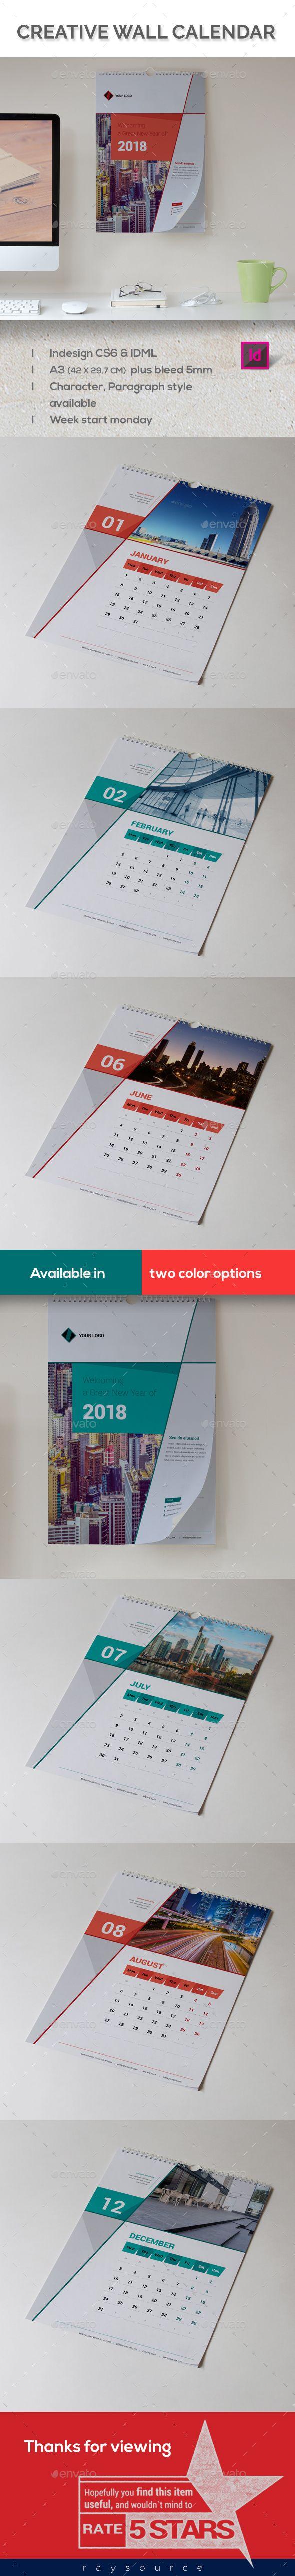 Corporate Wall Calender 2018 | Pinterest